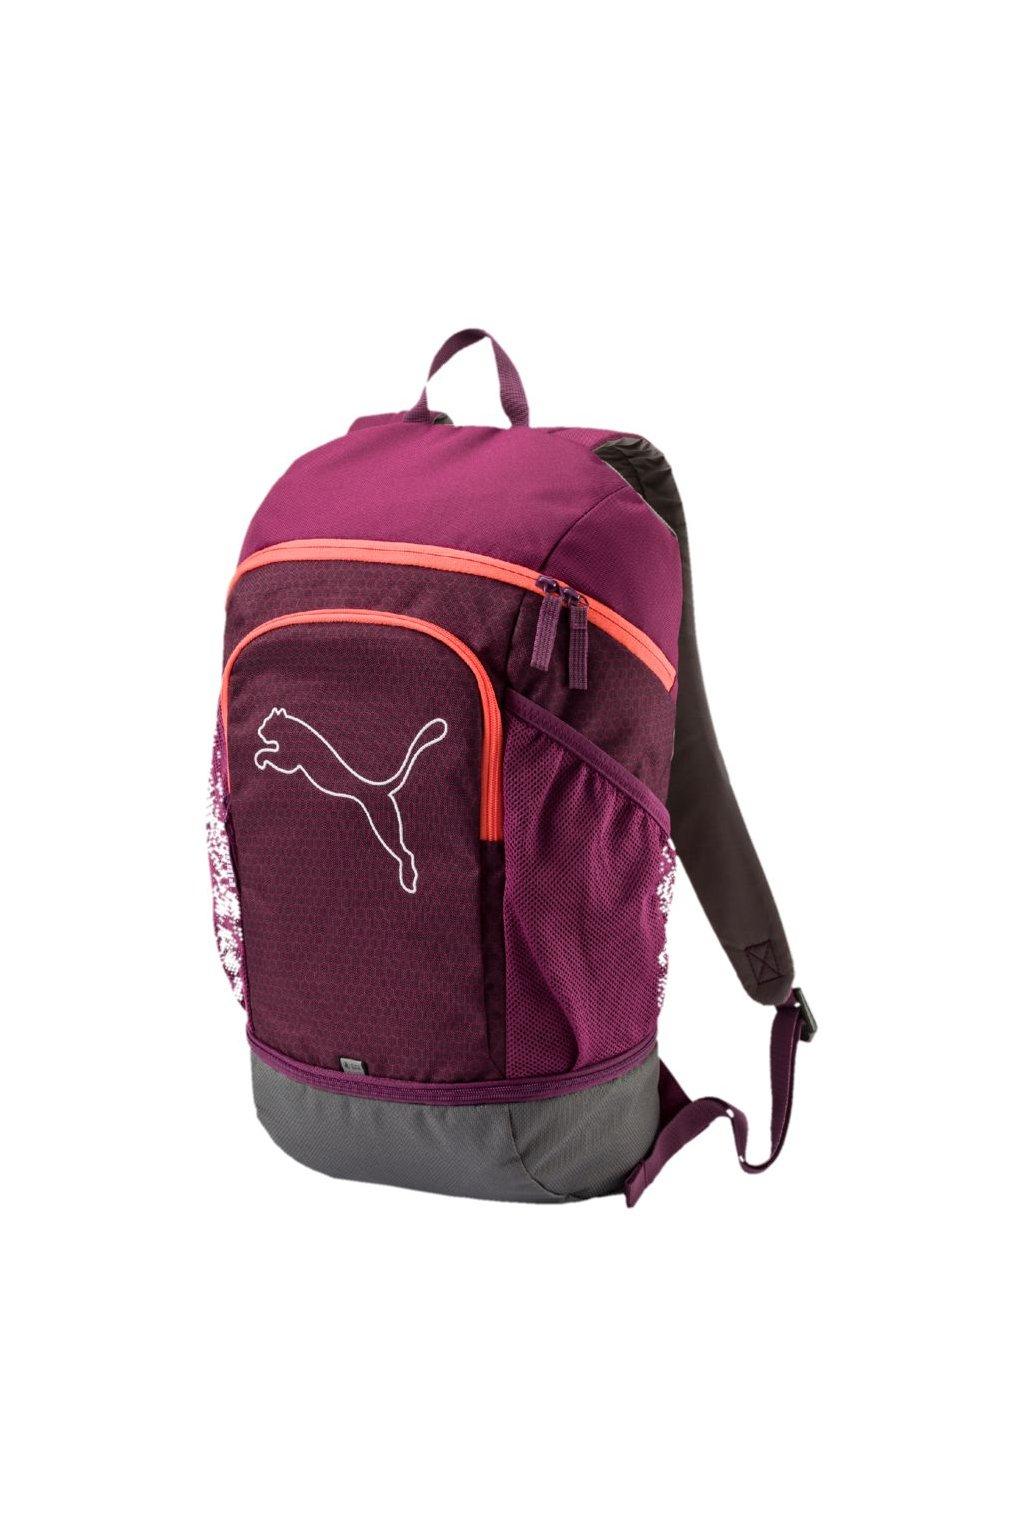 Batoh Puma Echo 74396 07 fialový 23L